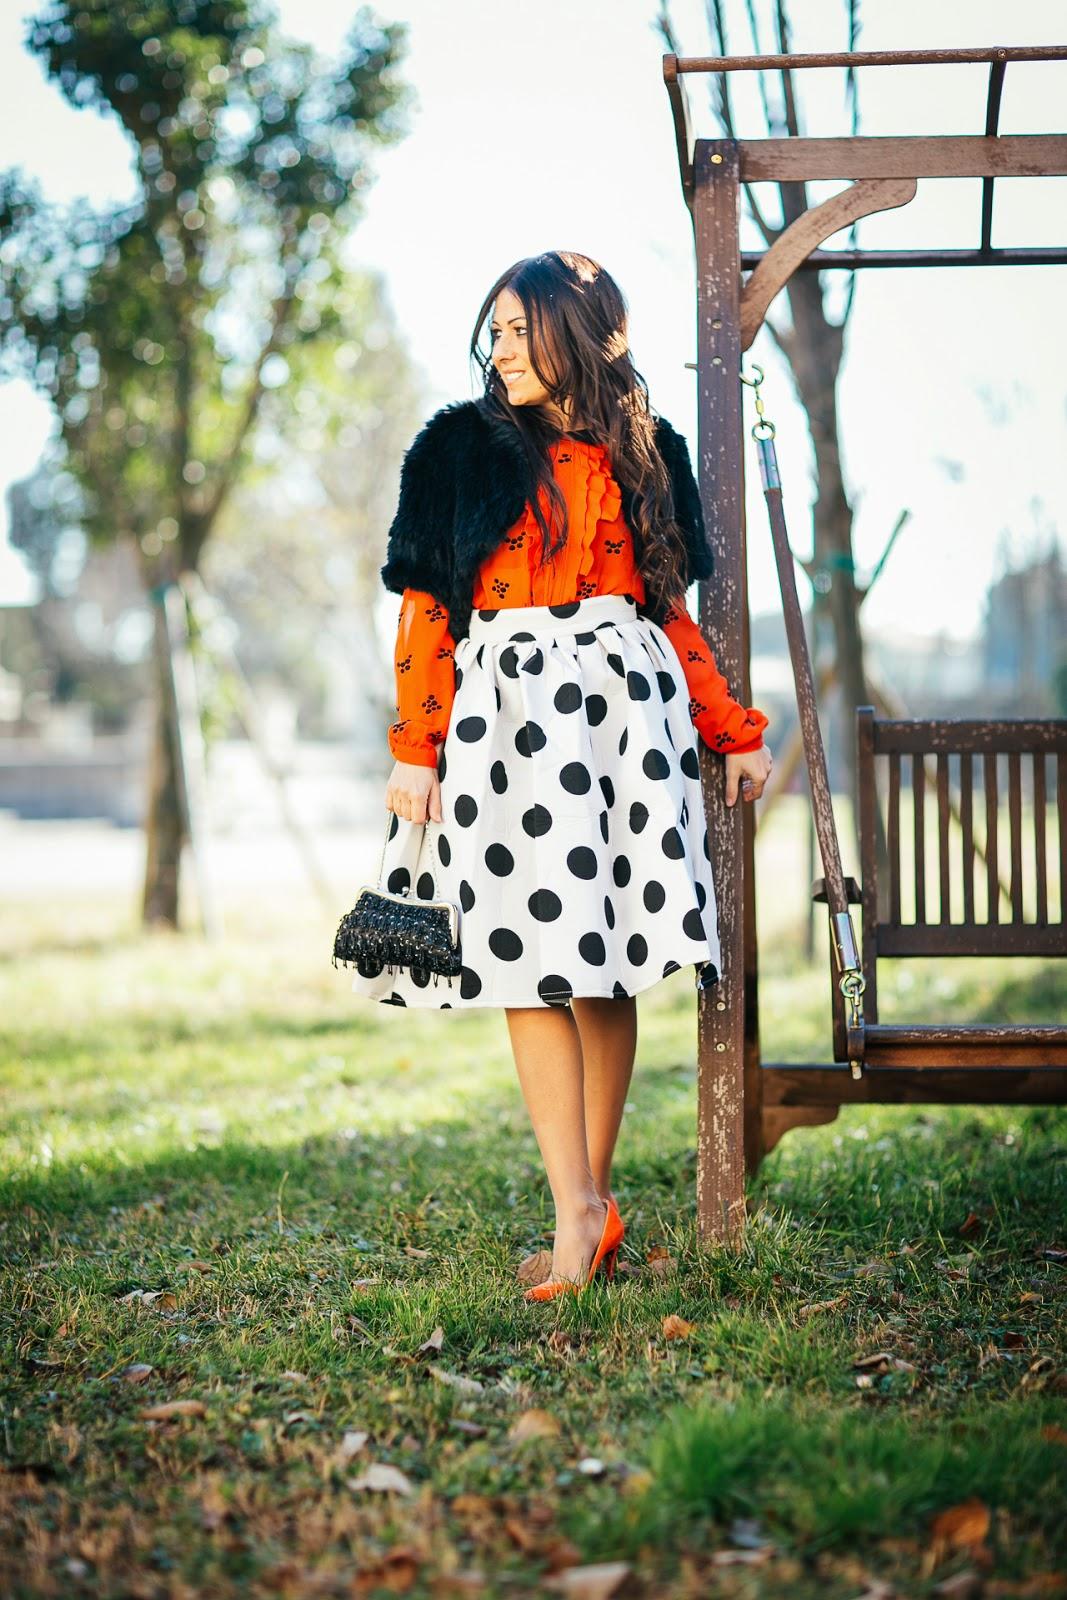 http://www.choies.com/product/white-polka-dot-skater-skirt_p23996?cid=7092jesspai